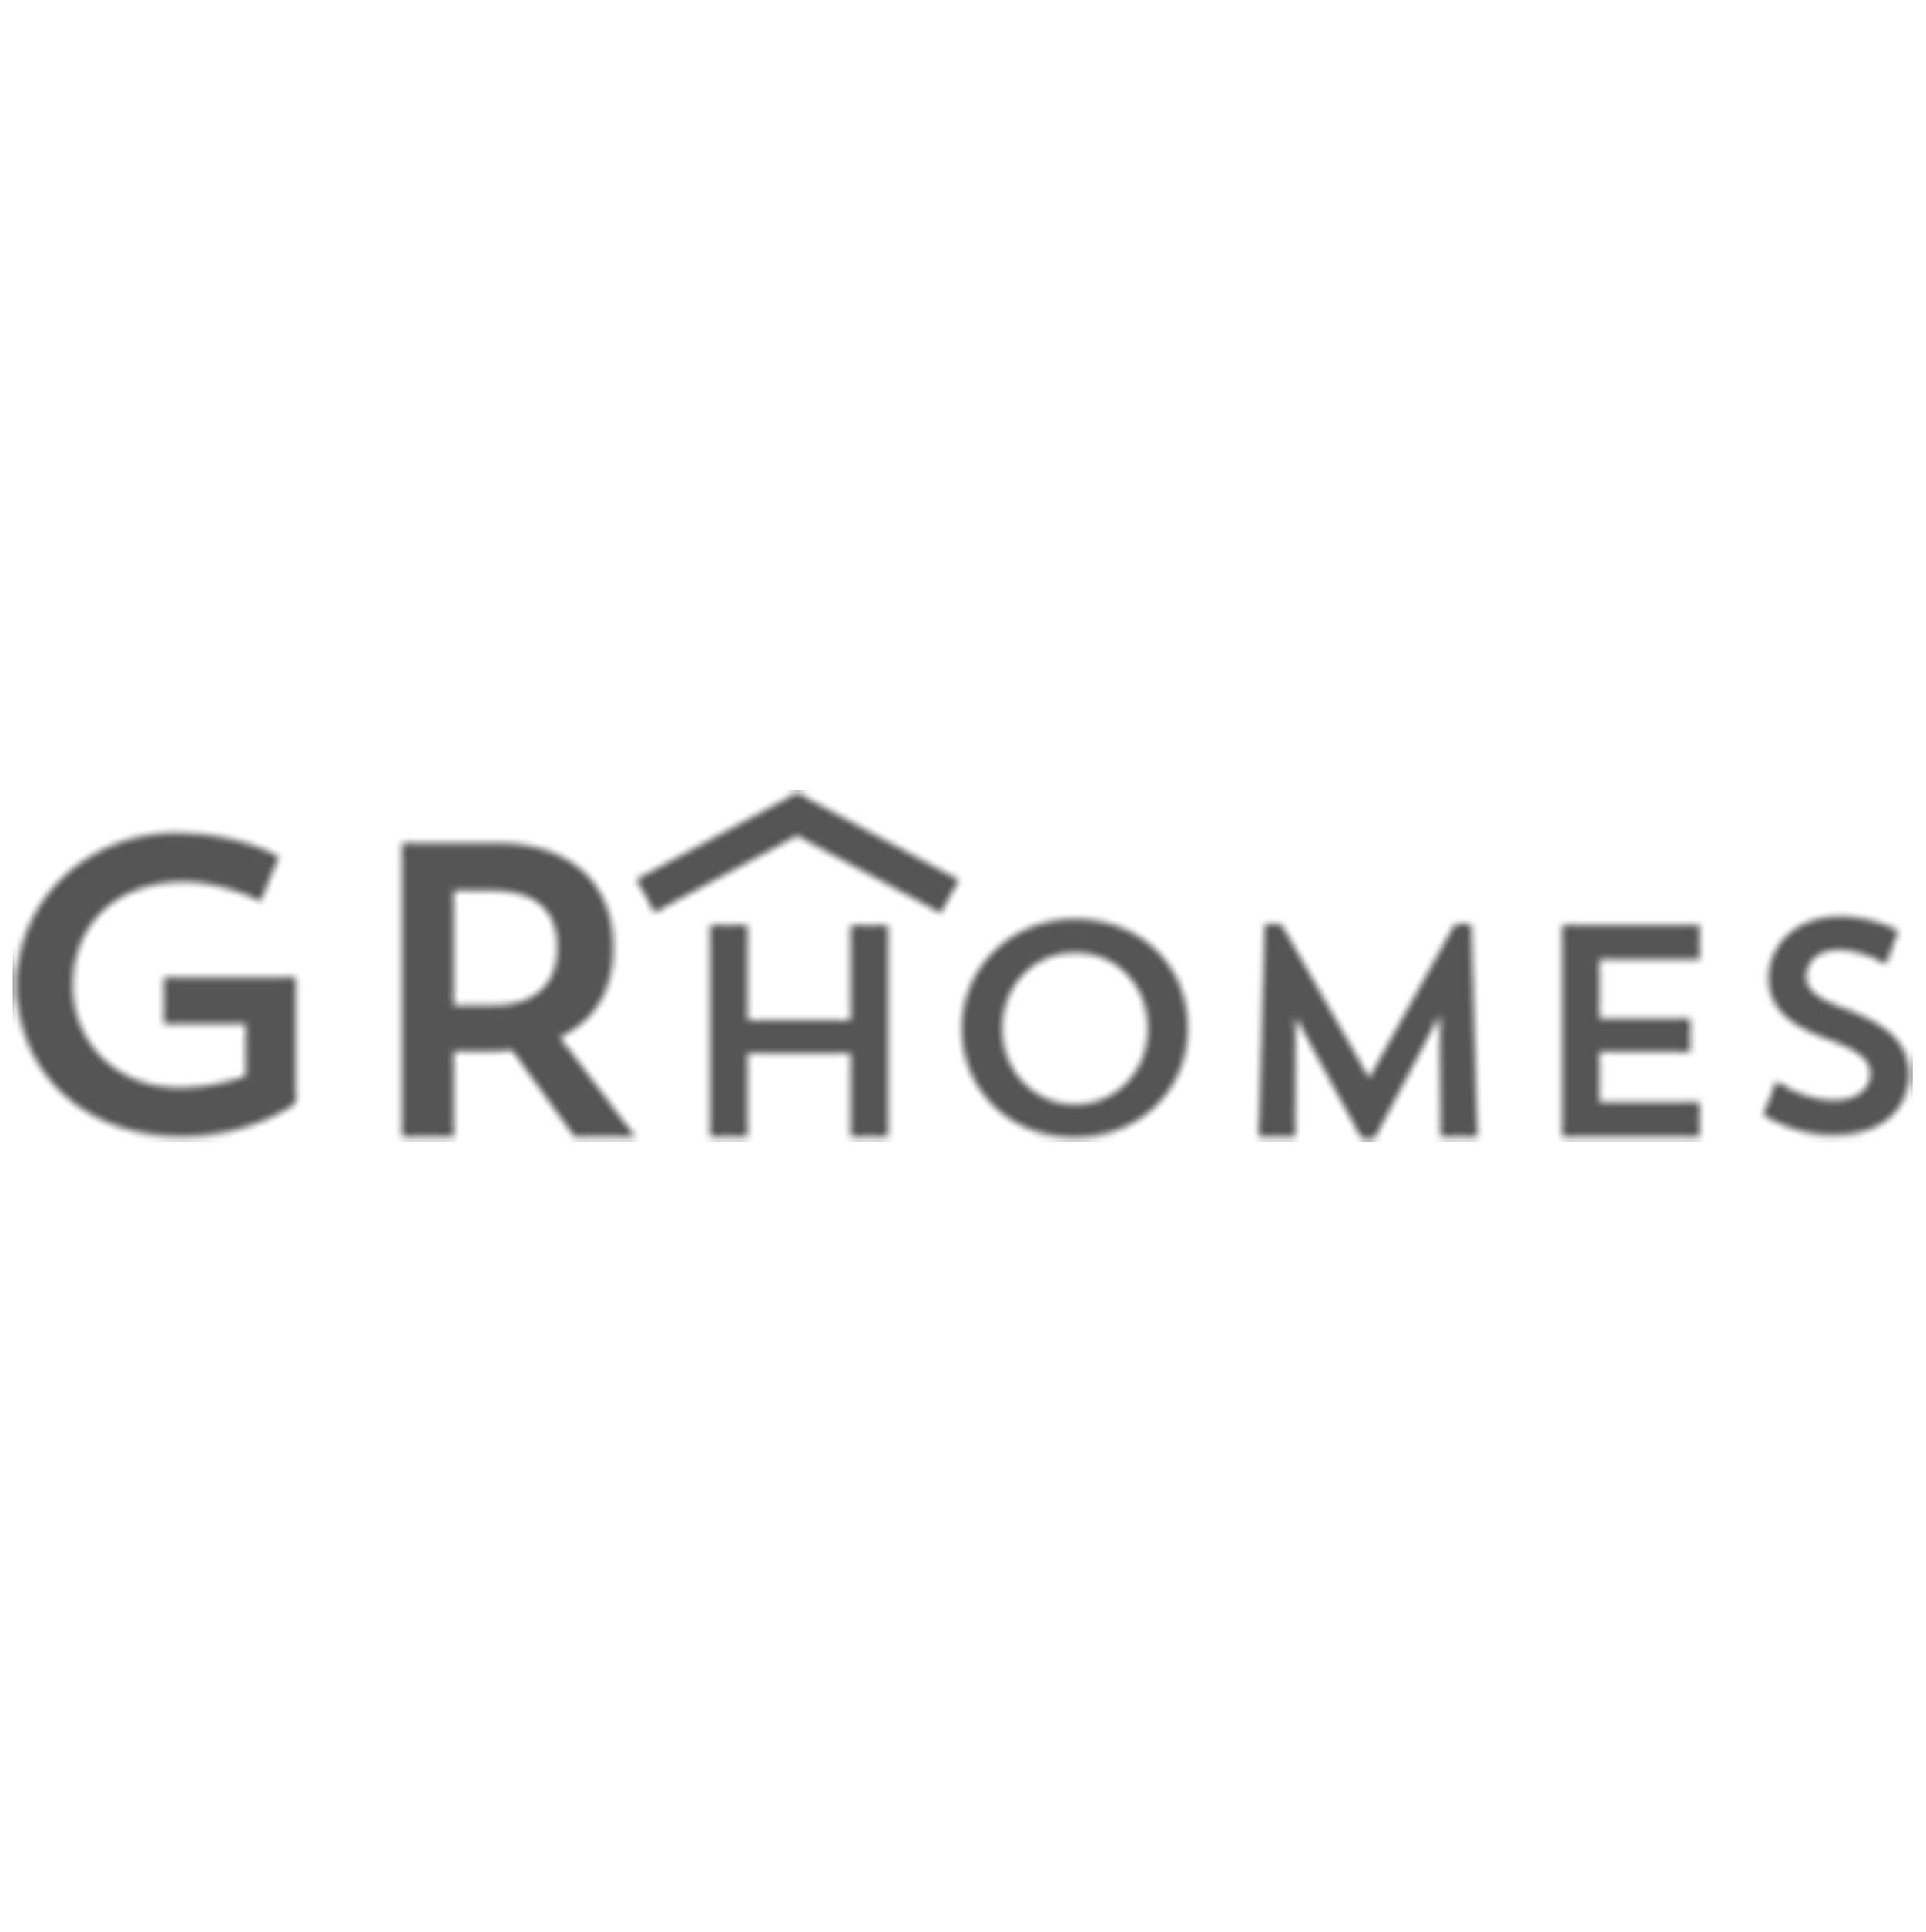 GrHomes_Gray.jpg